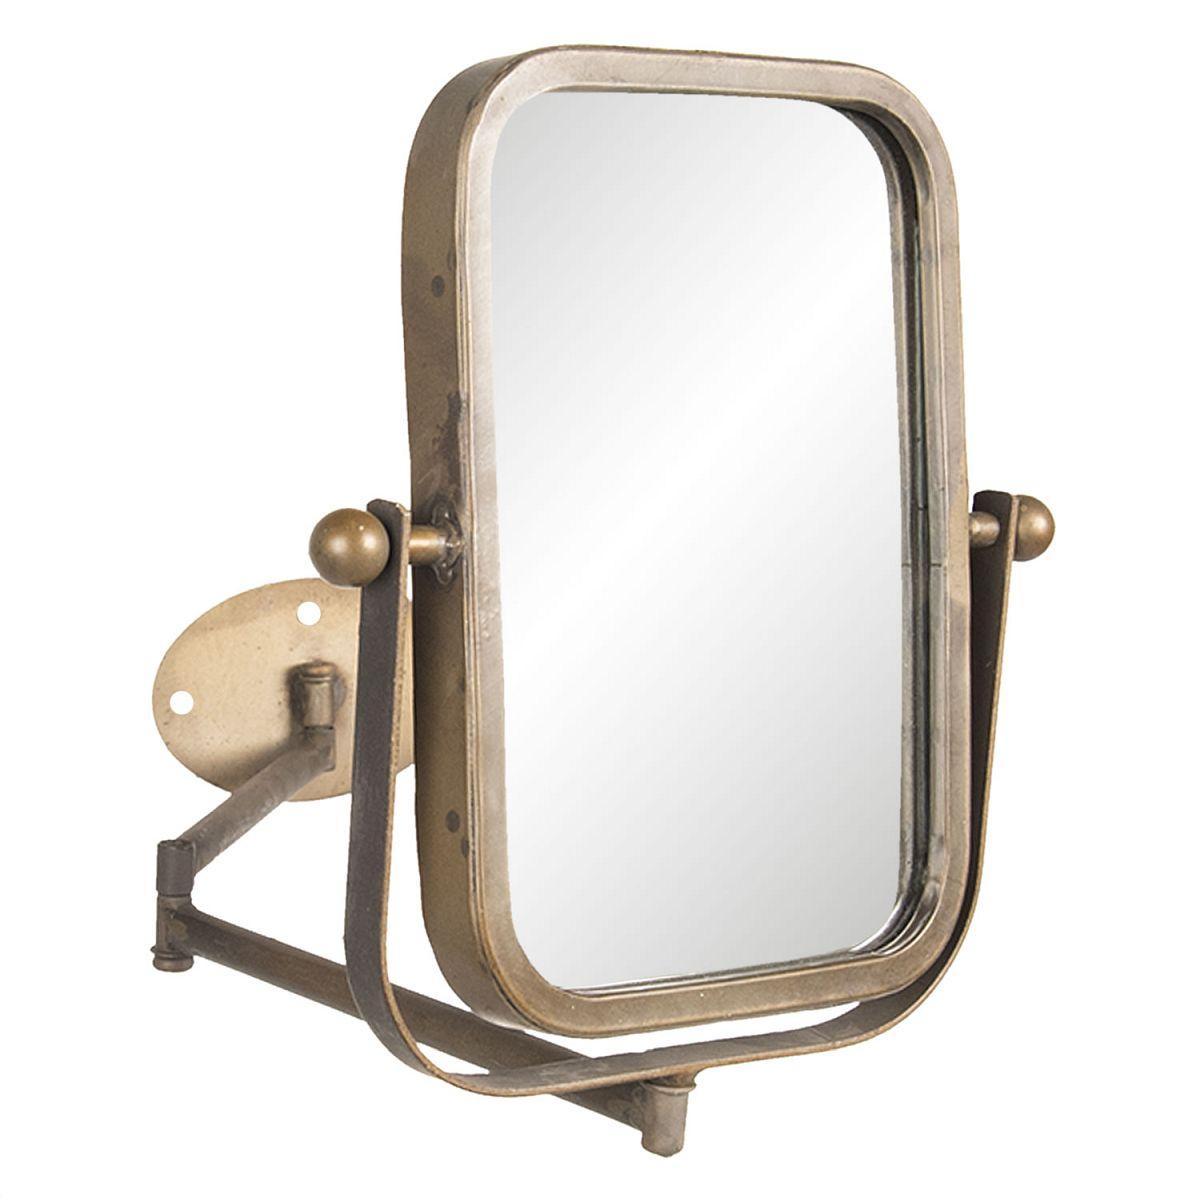 Nástěnné otočné zrcadlo